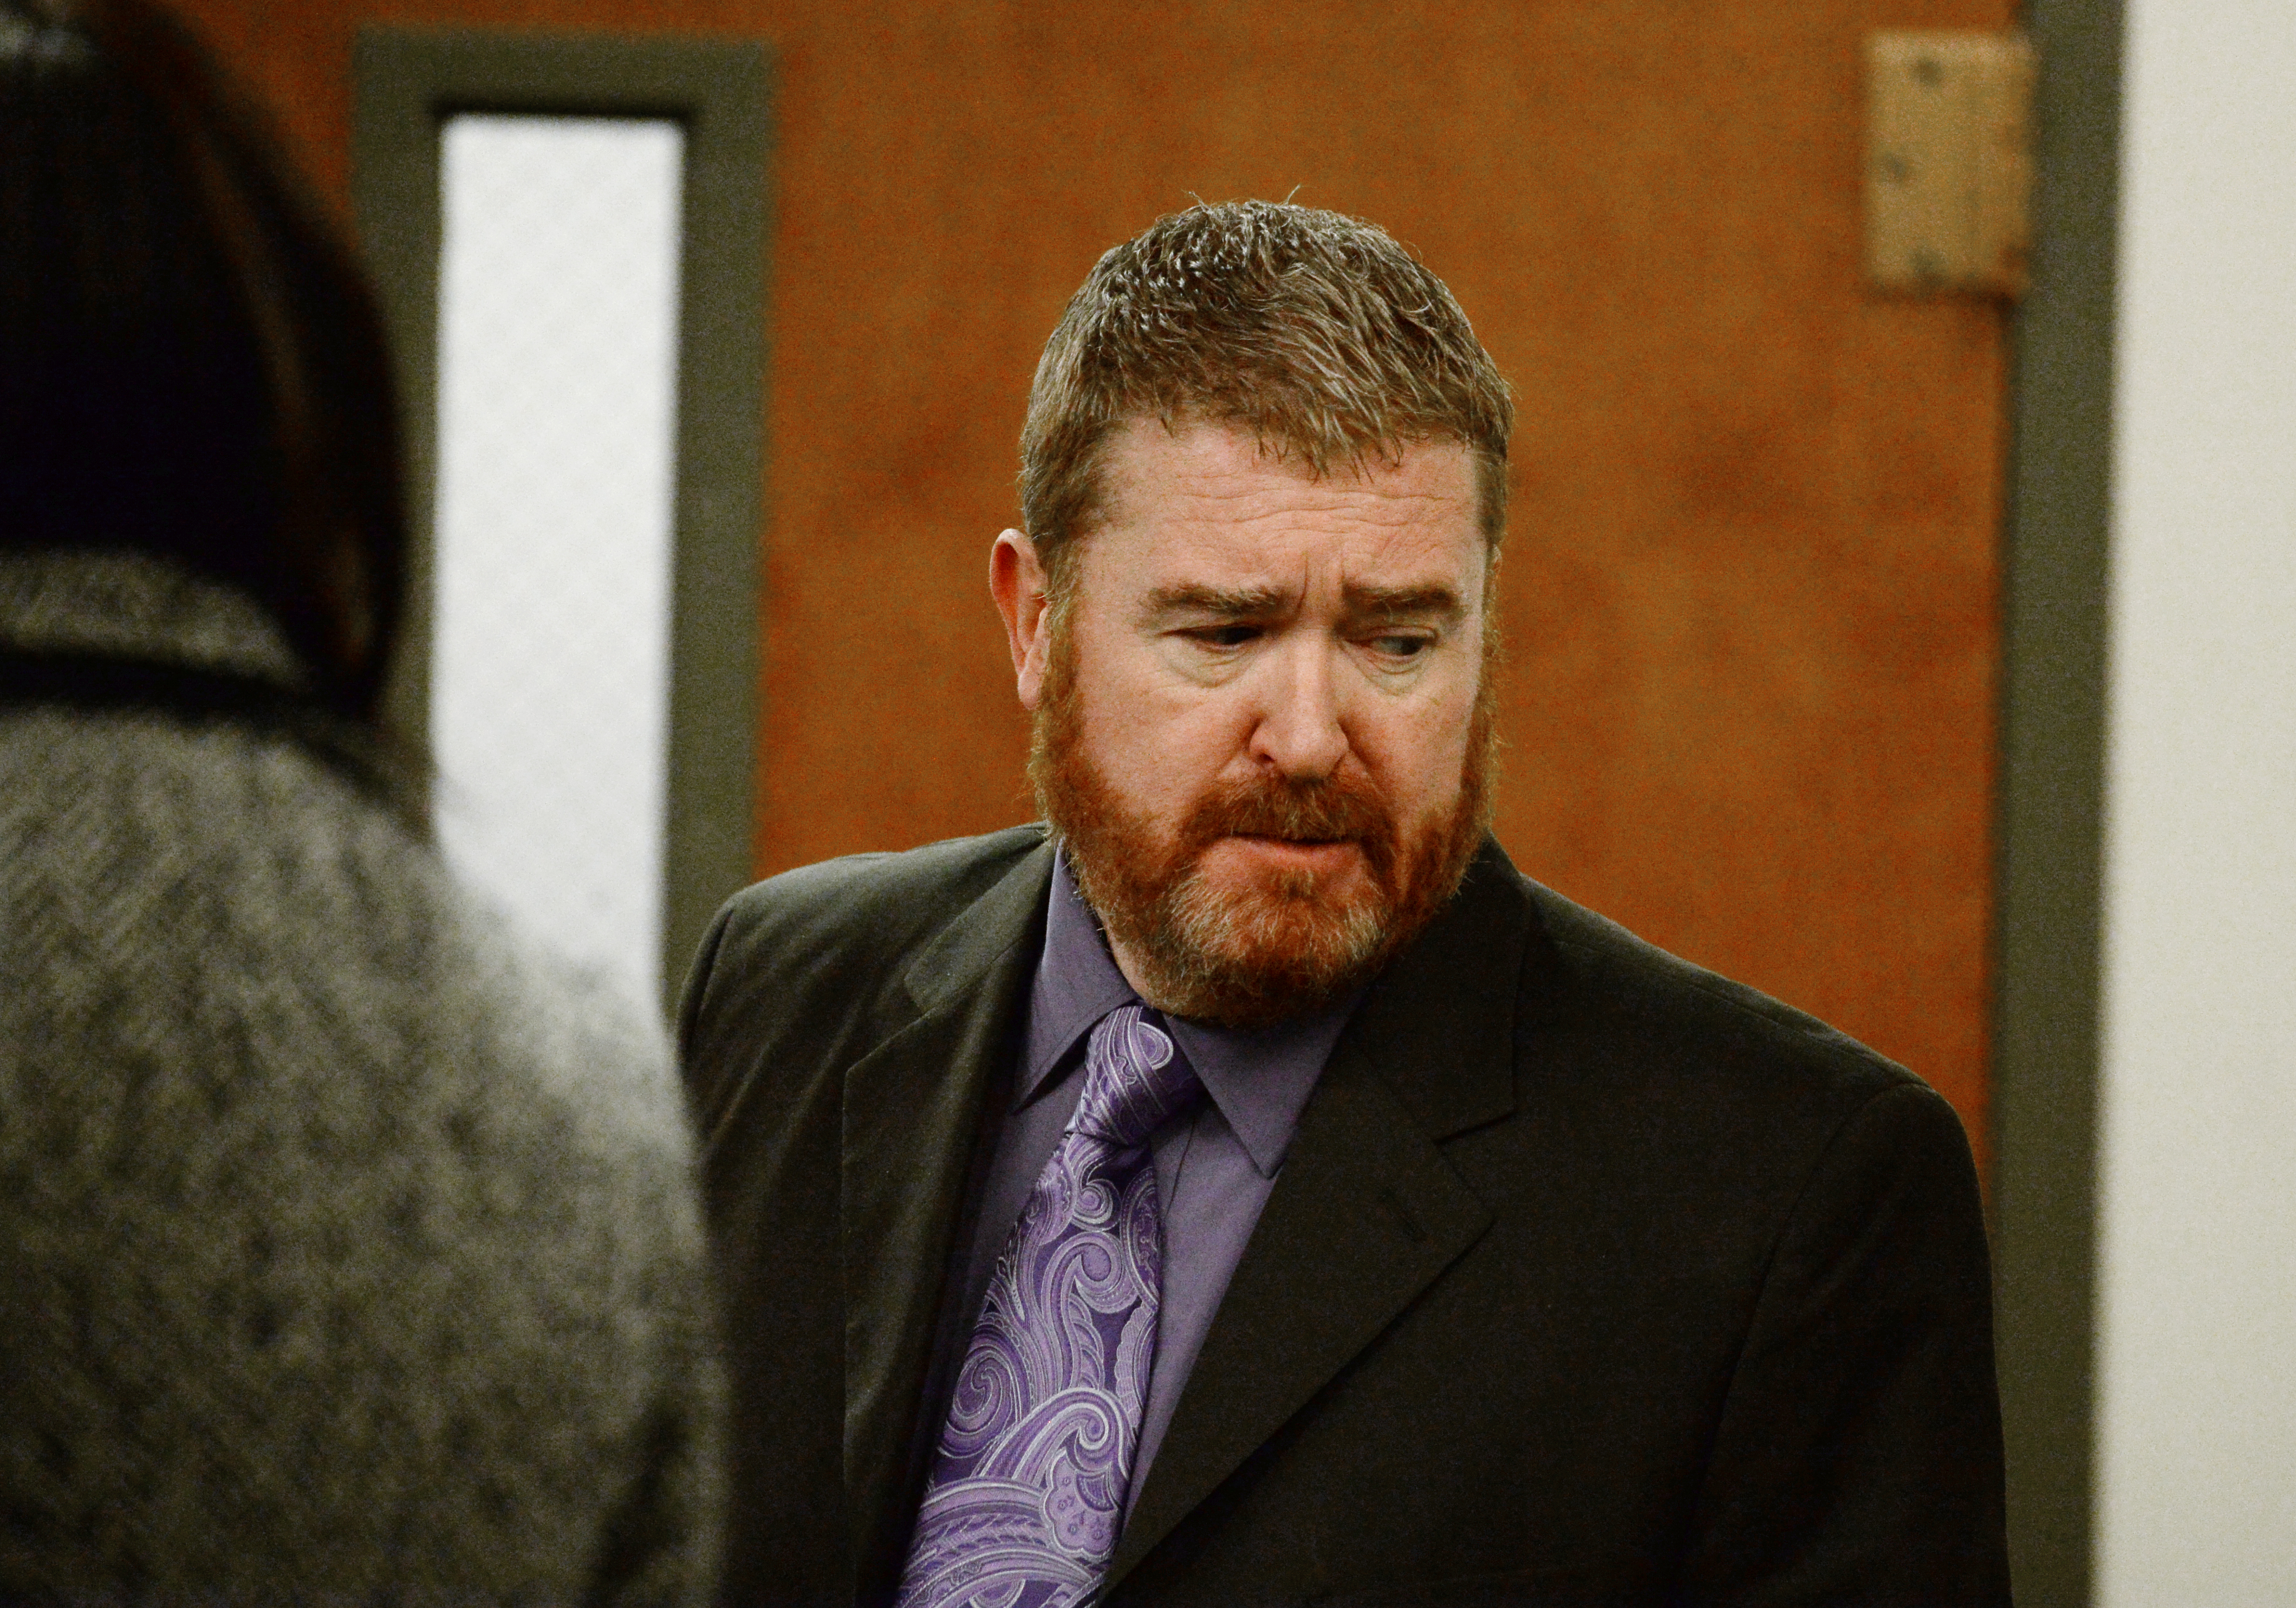 Photo: Aurora Theater Shooting James Holmes Defense Attorney Daniel King